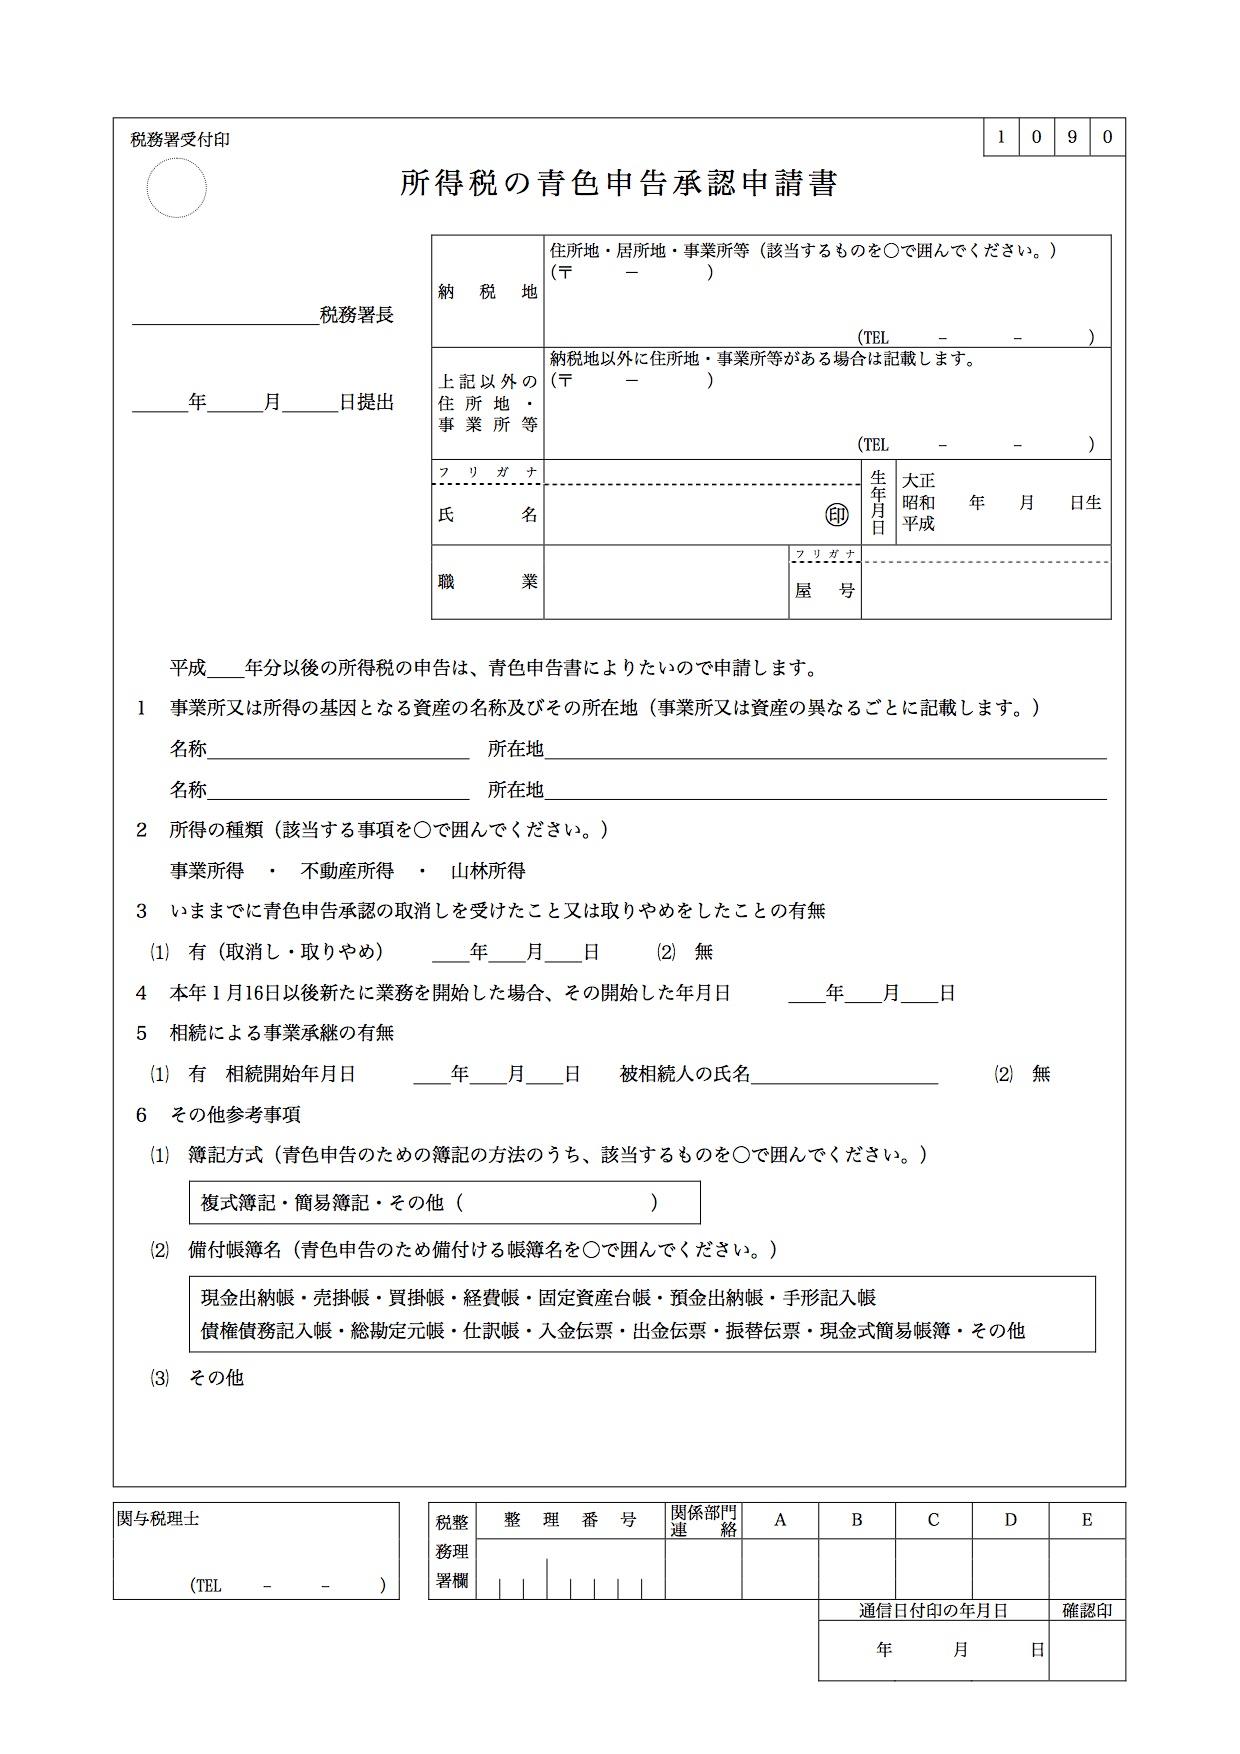 aoiro_sinkoku_sinsei-1